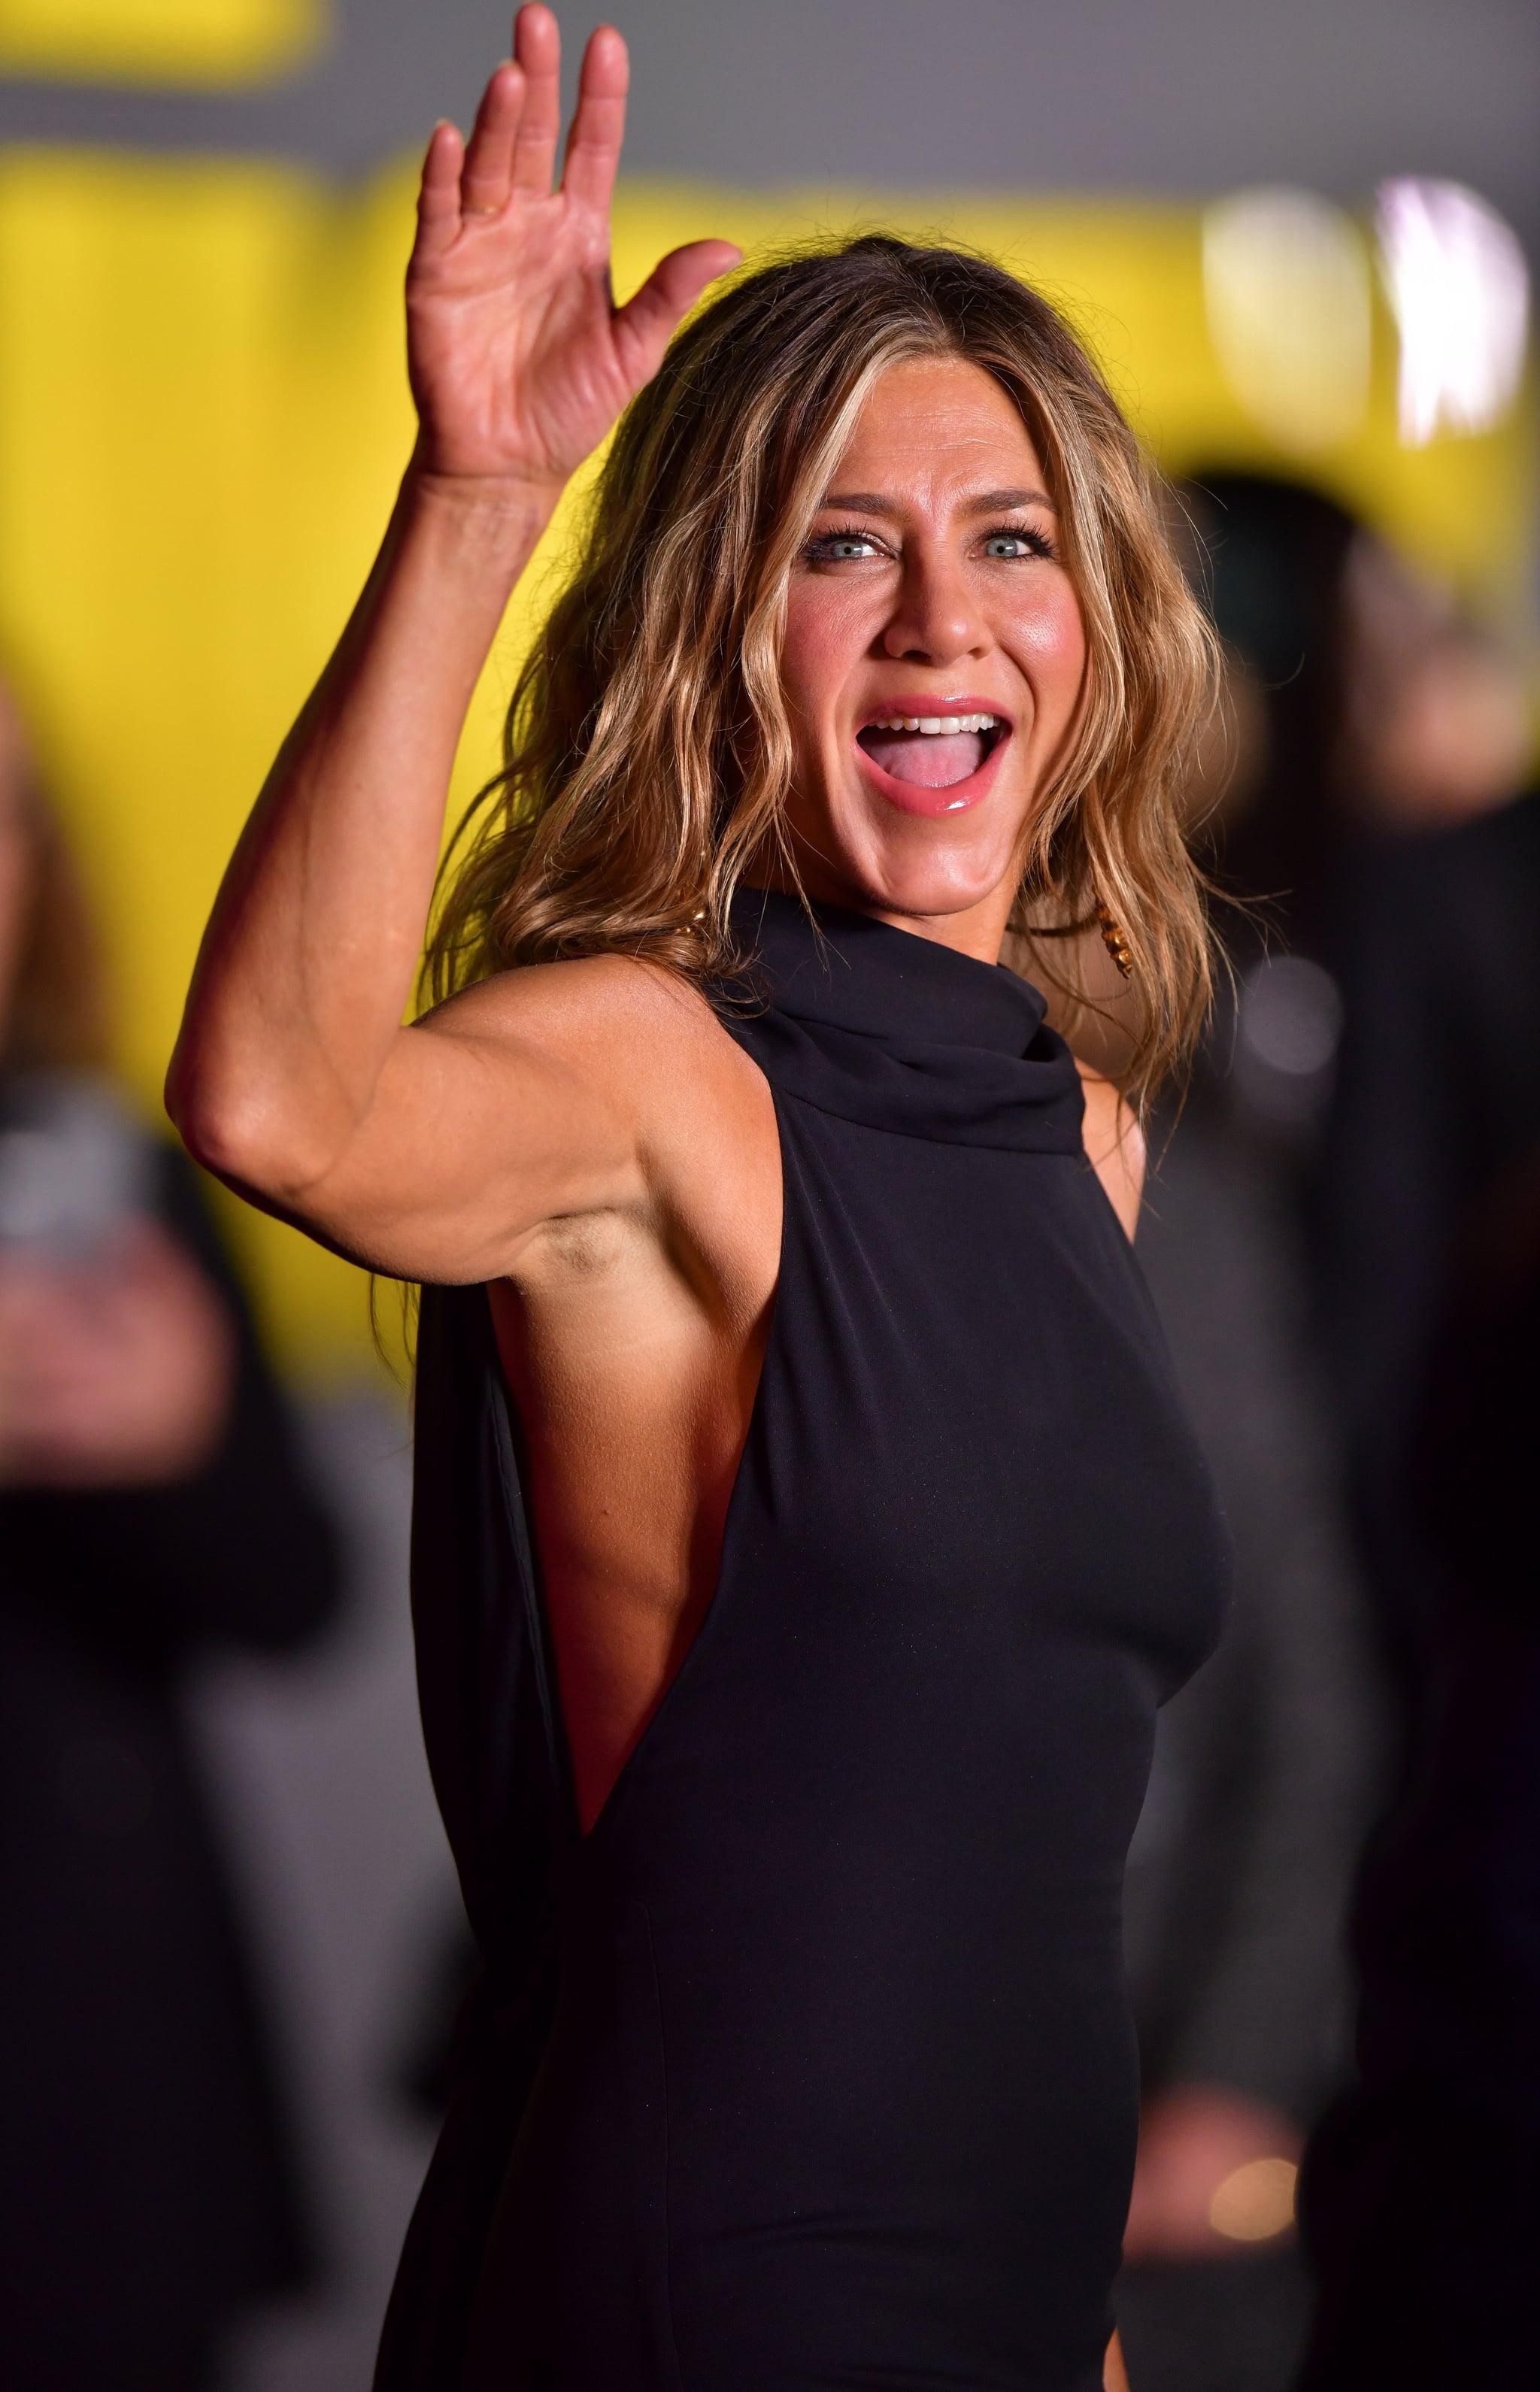 Aniston hot jennifer Jennifer Aniston's